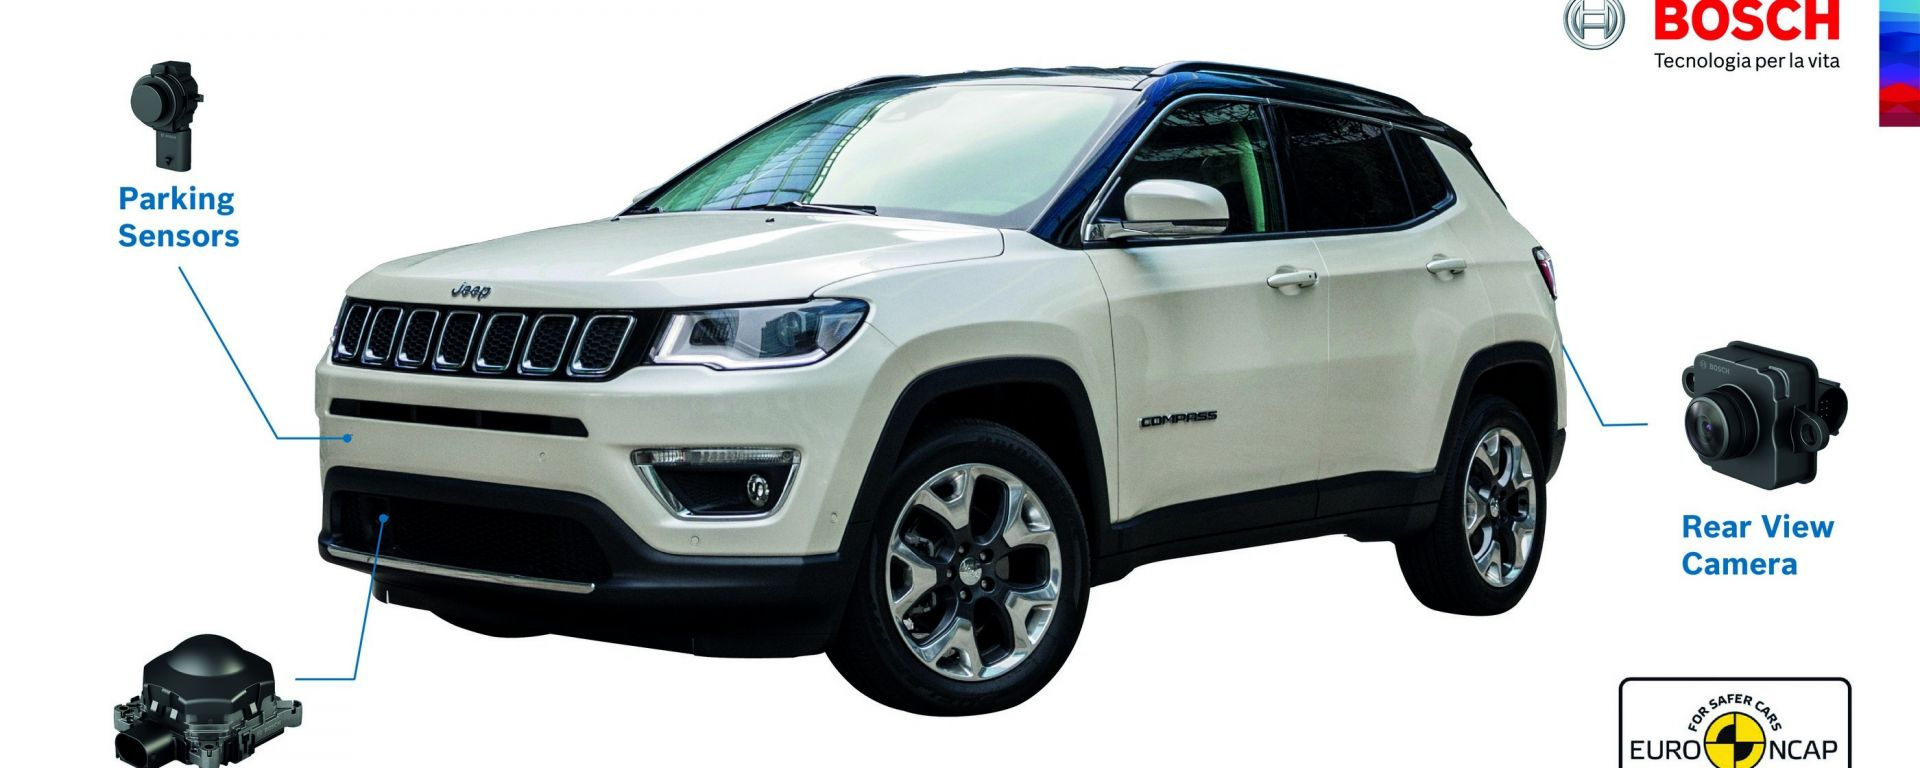 Euro NCAP: 5 stelle per Jeep Compass grazie alle tecnologie Bosch